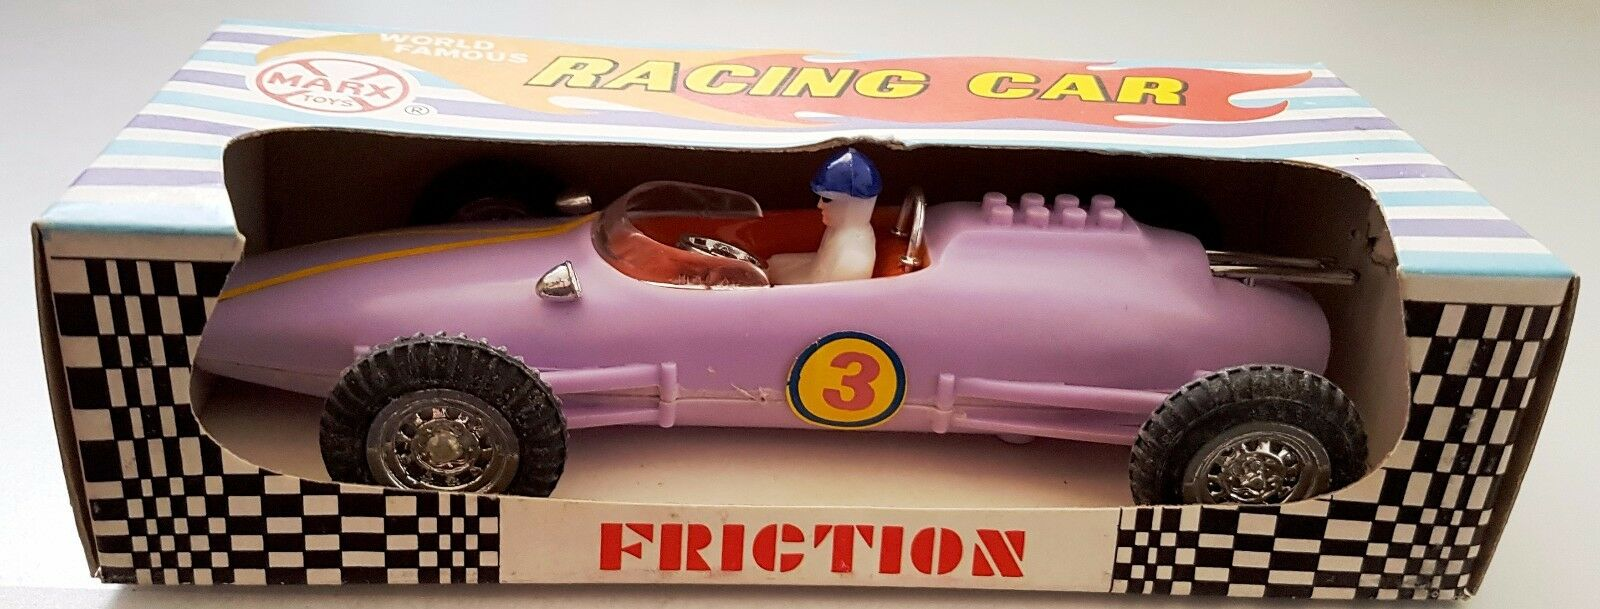 MARX Toys 1970 World Famous RACING CAR Friction Drive in ORIGINAL BOX - purplec  3